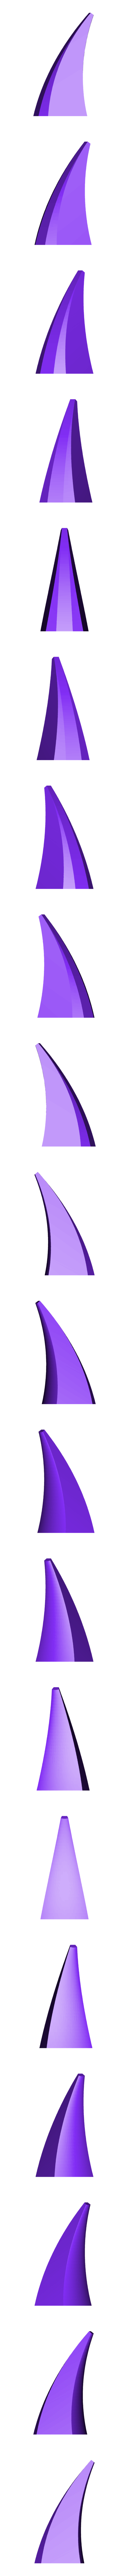 Tail-Lower.STL Download STL file Grimlock • Model to 3D print, biglildesign